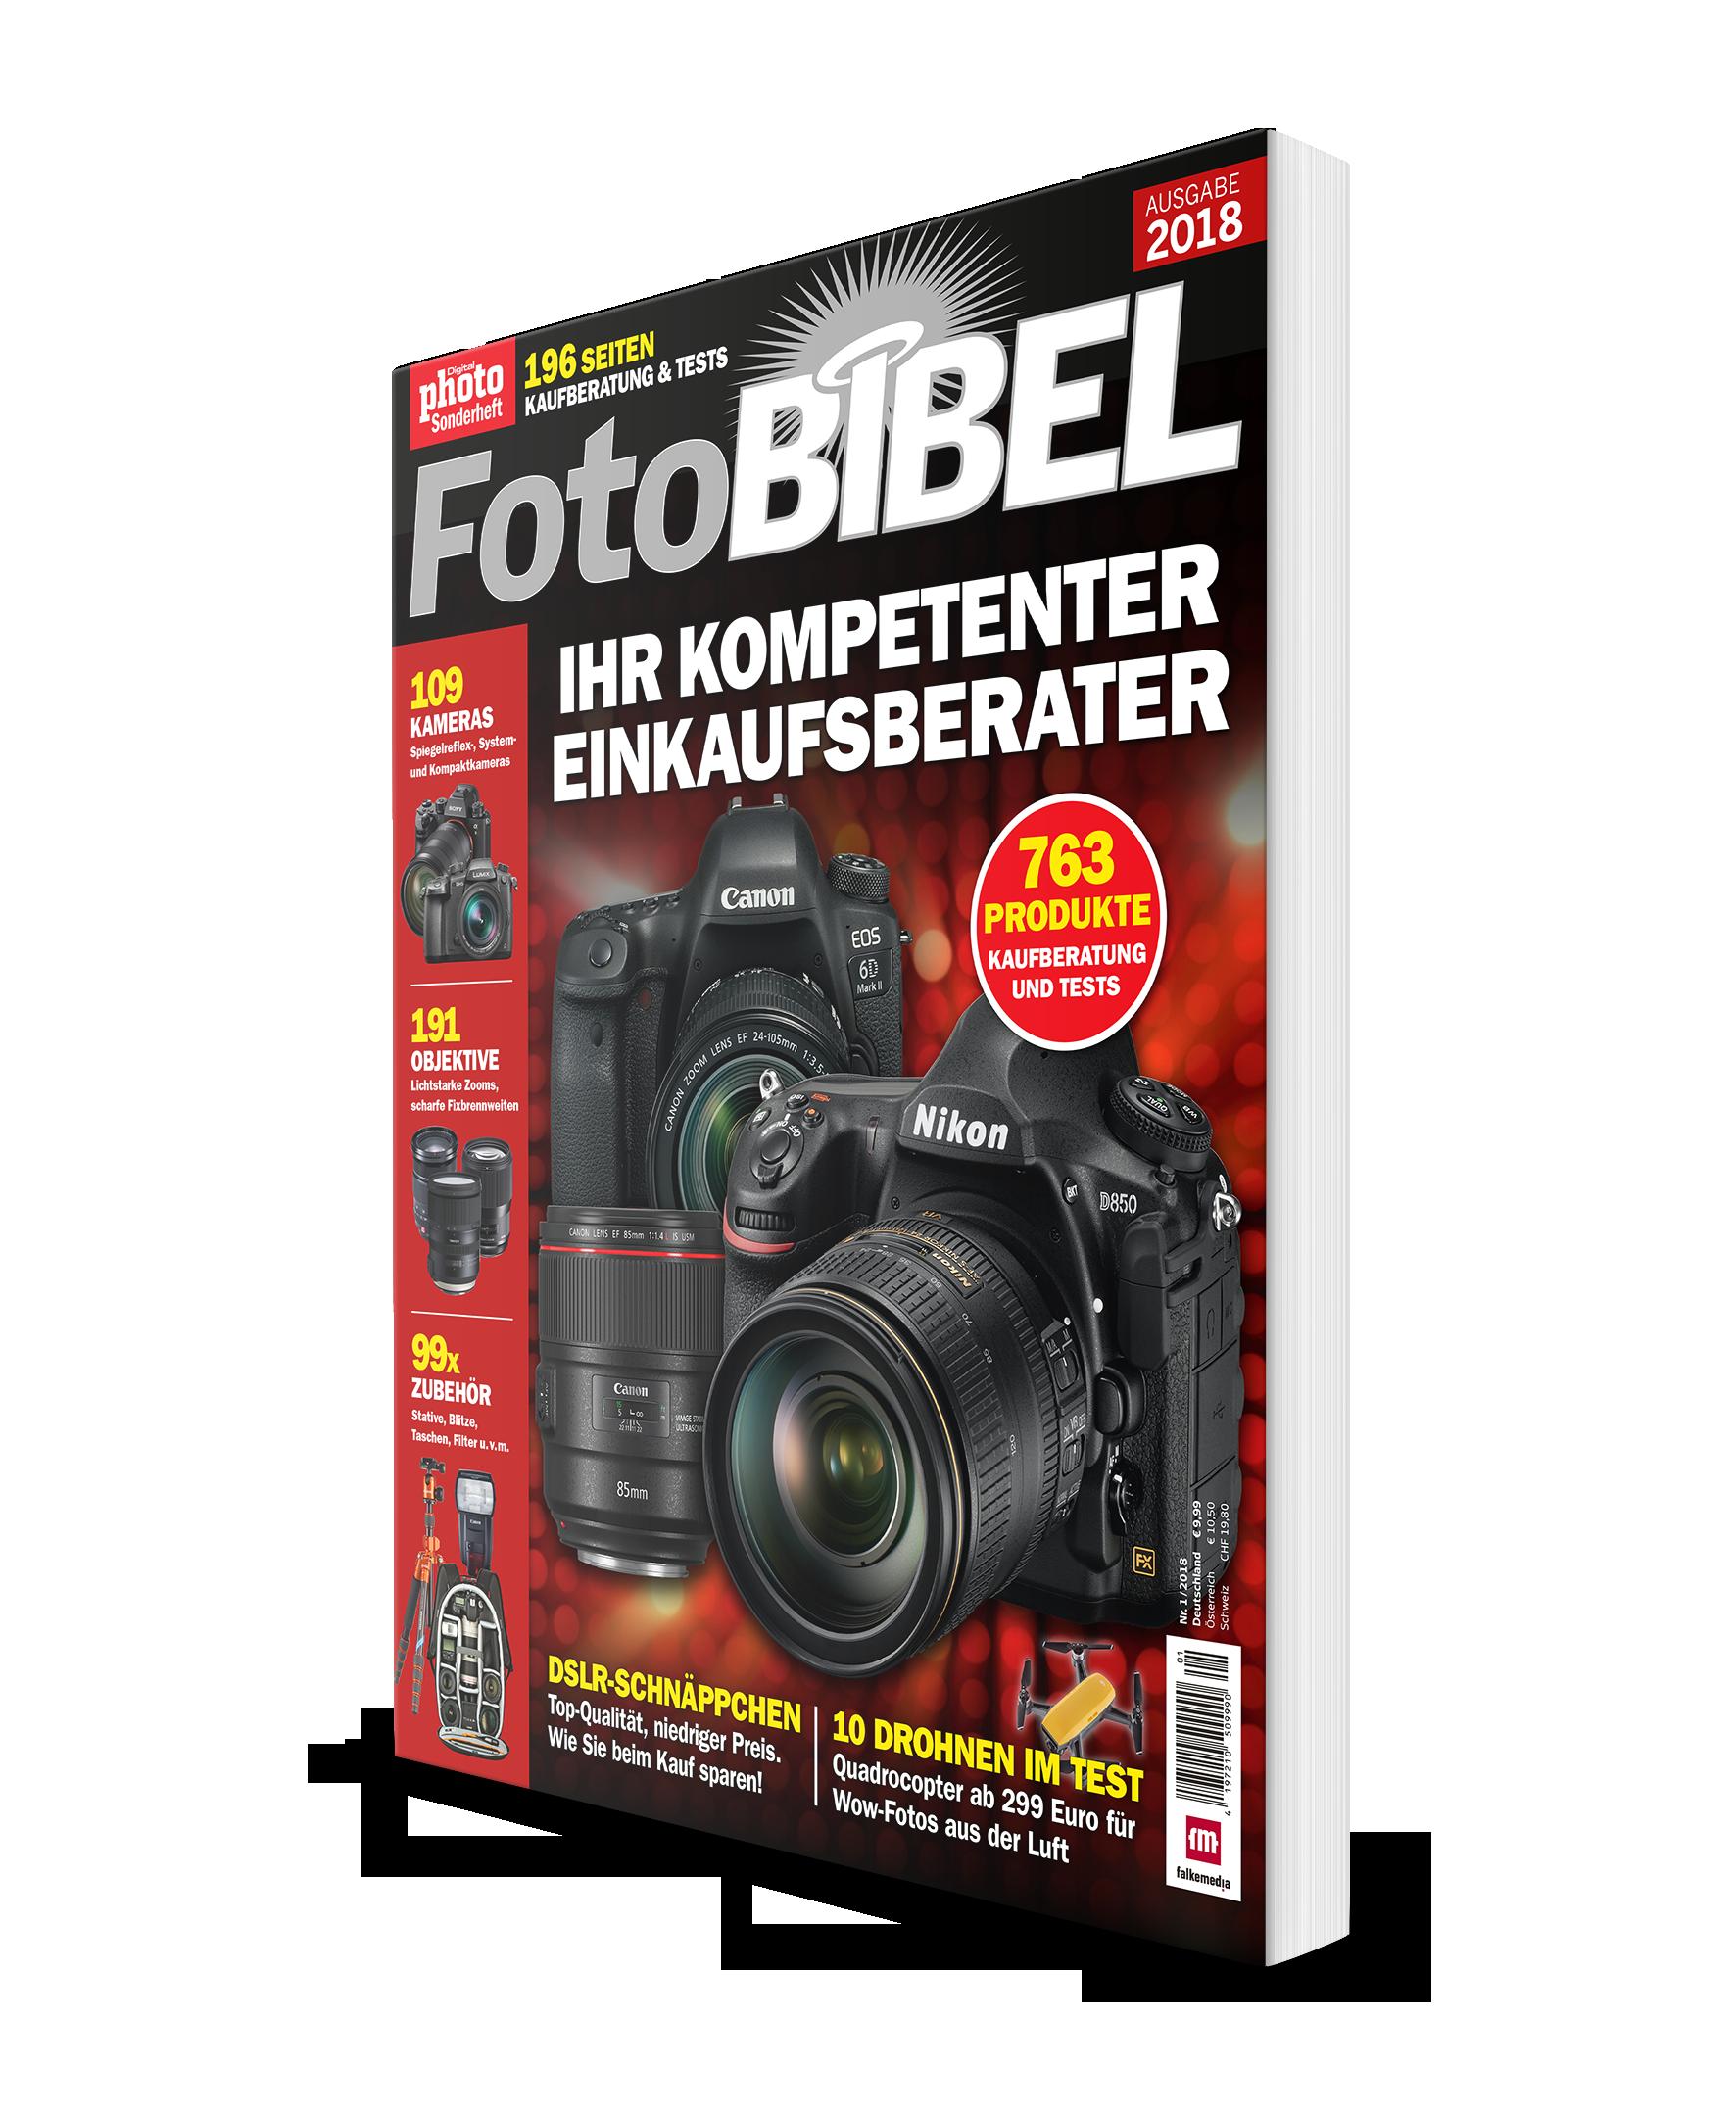 Fotografie - Magazine cover